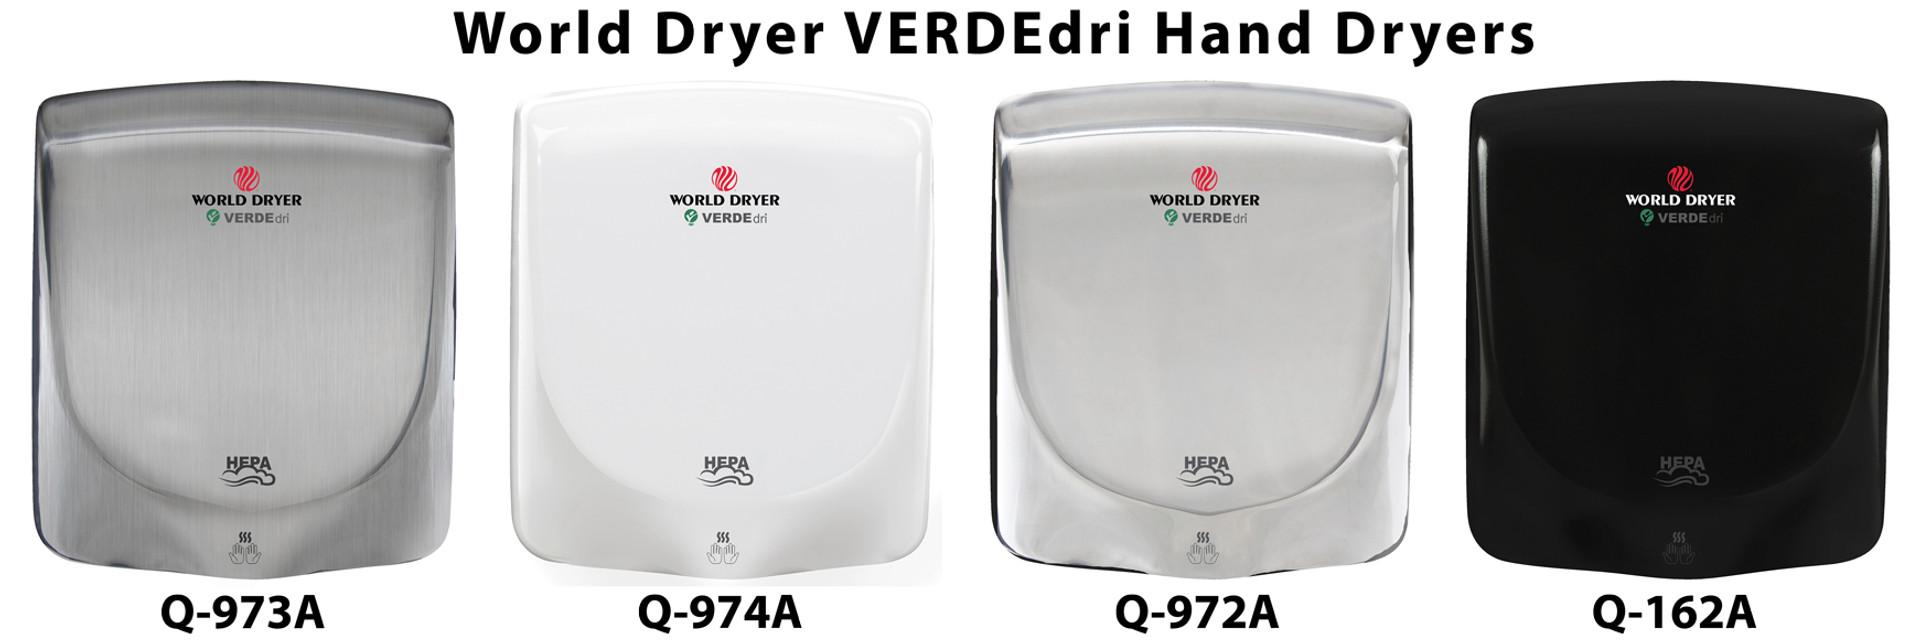 World Dryer Verdedri Hand Dryers